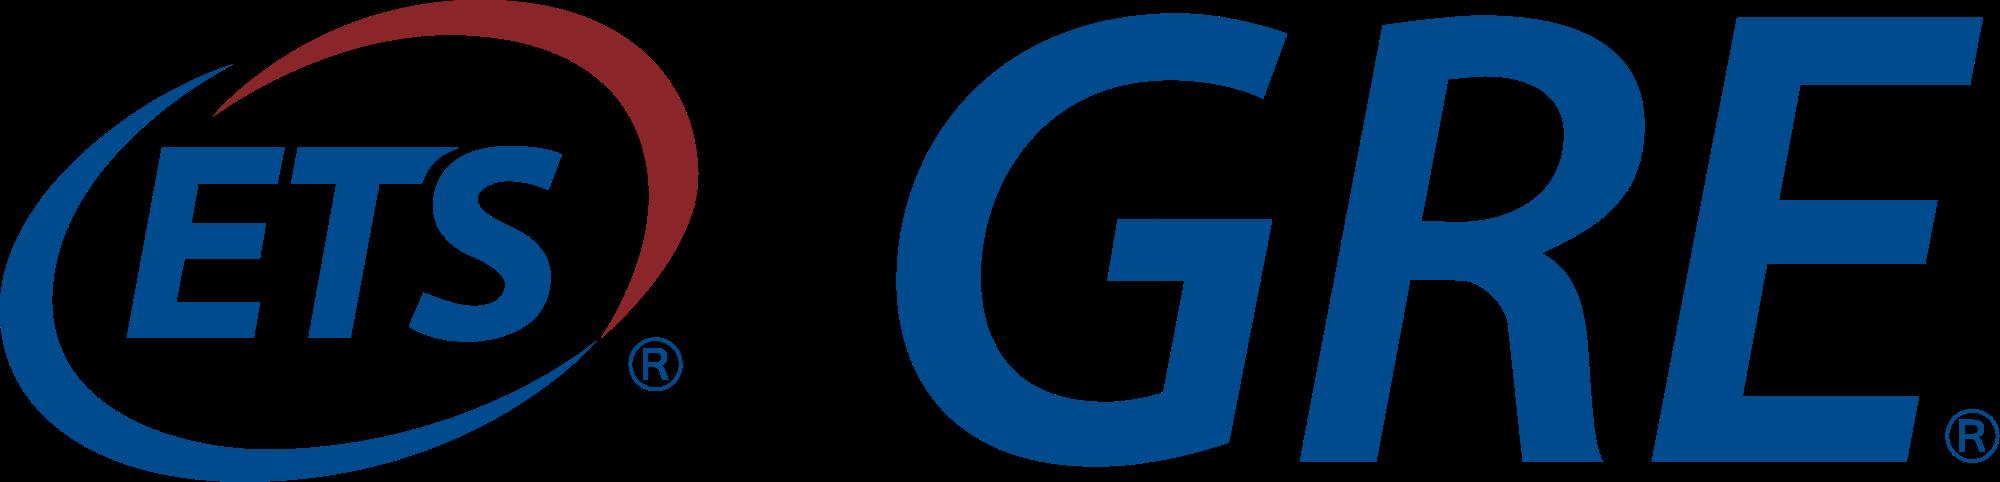 GRE (Graduate Research Examination) Sınavı